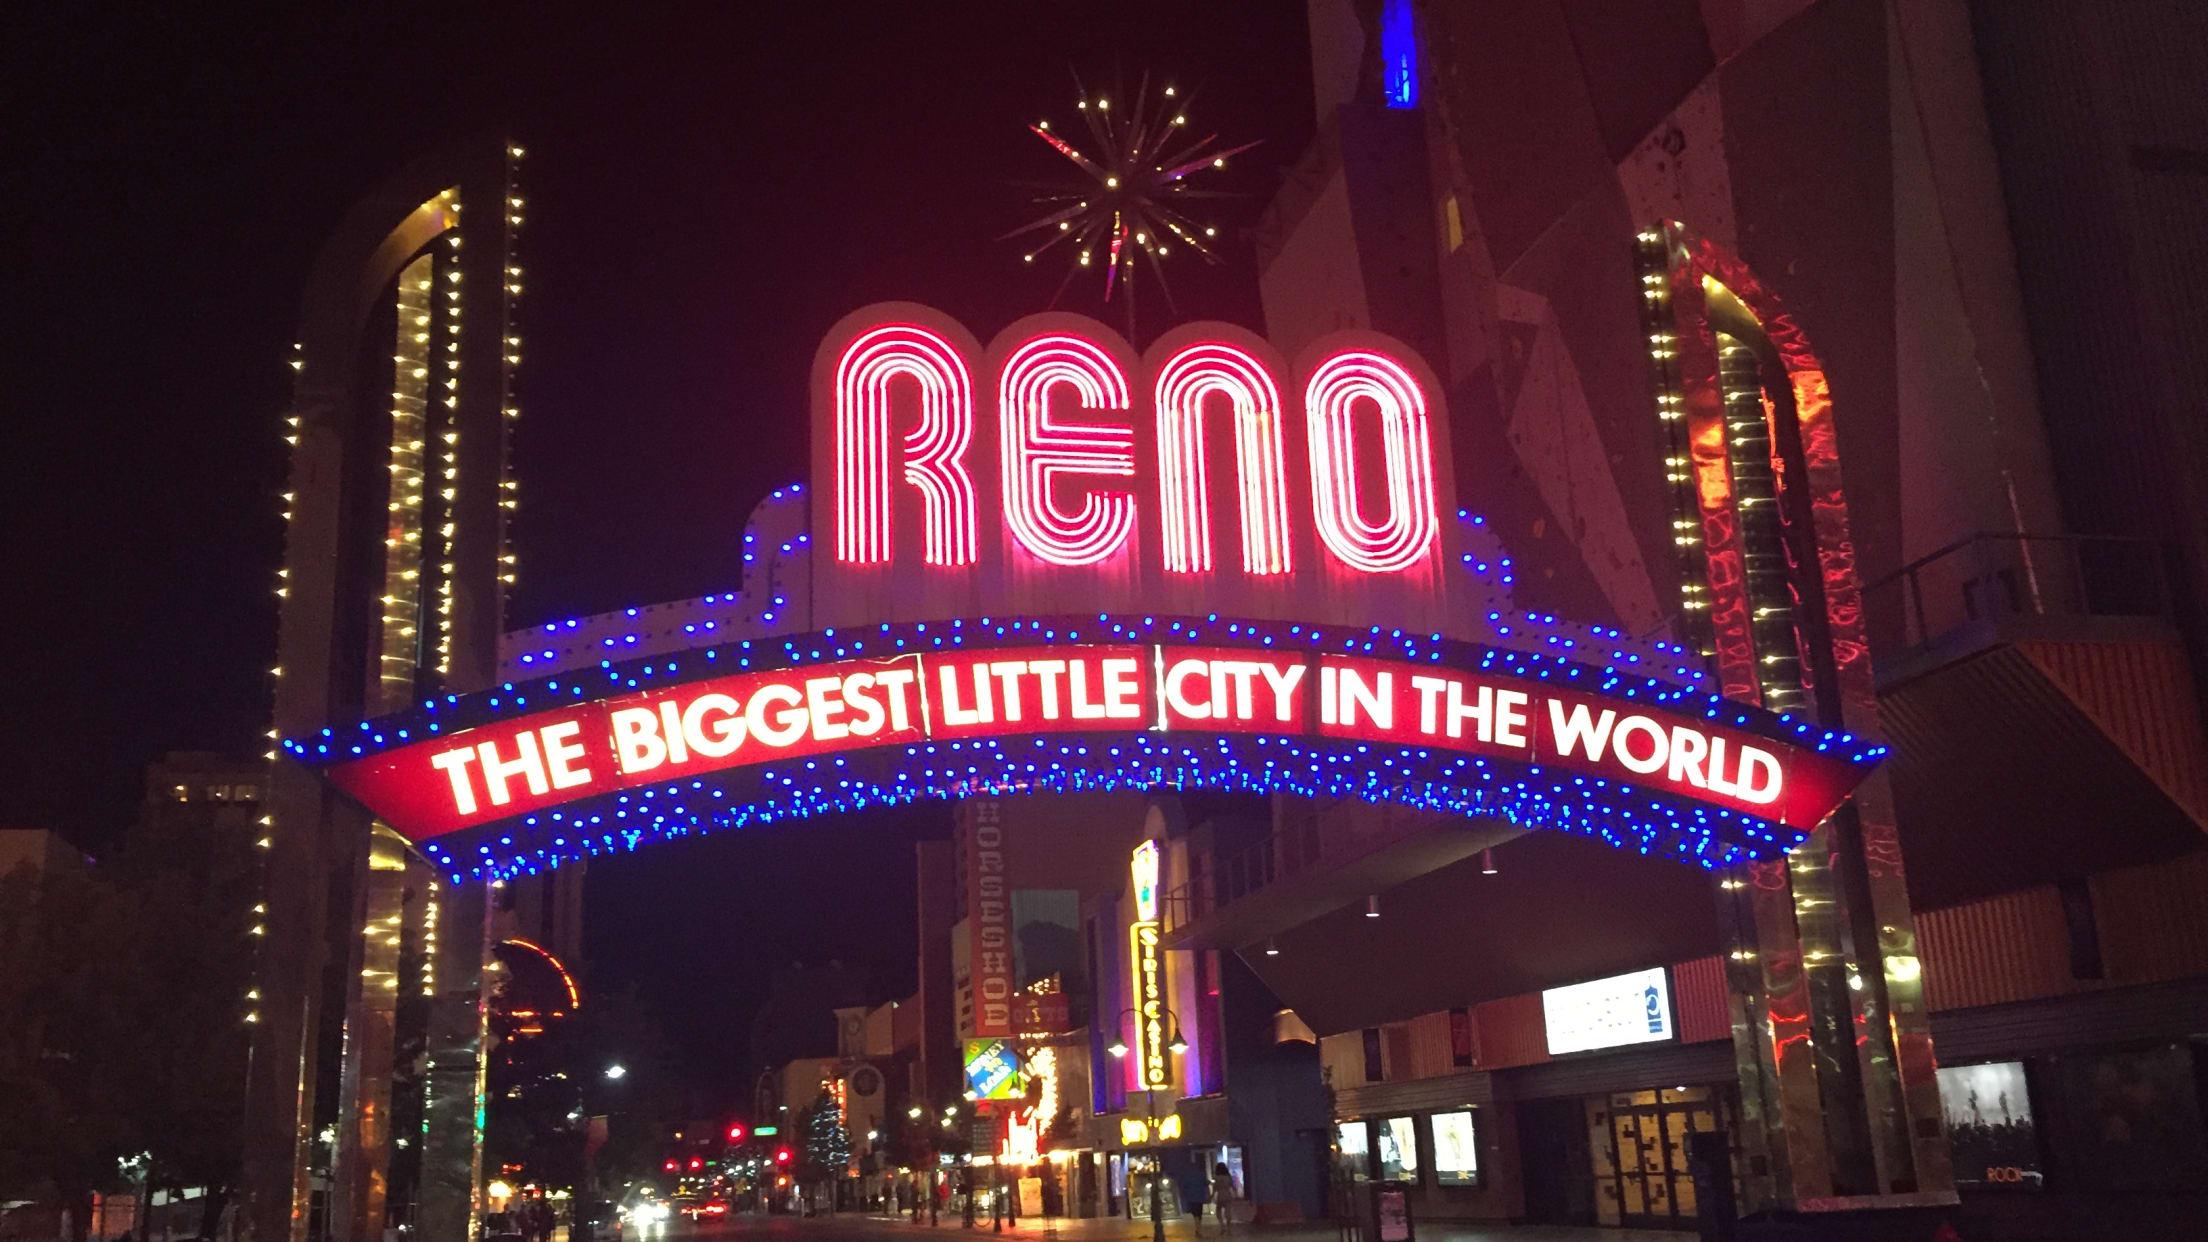 reno_biggestlittle